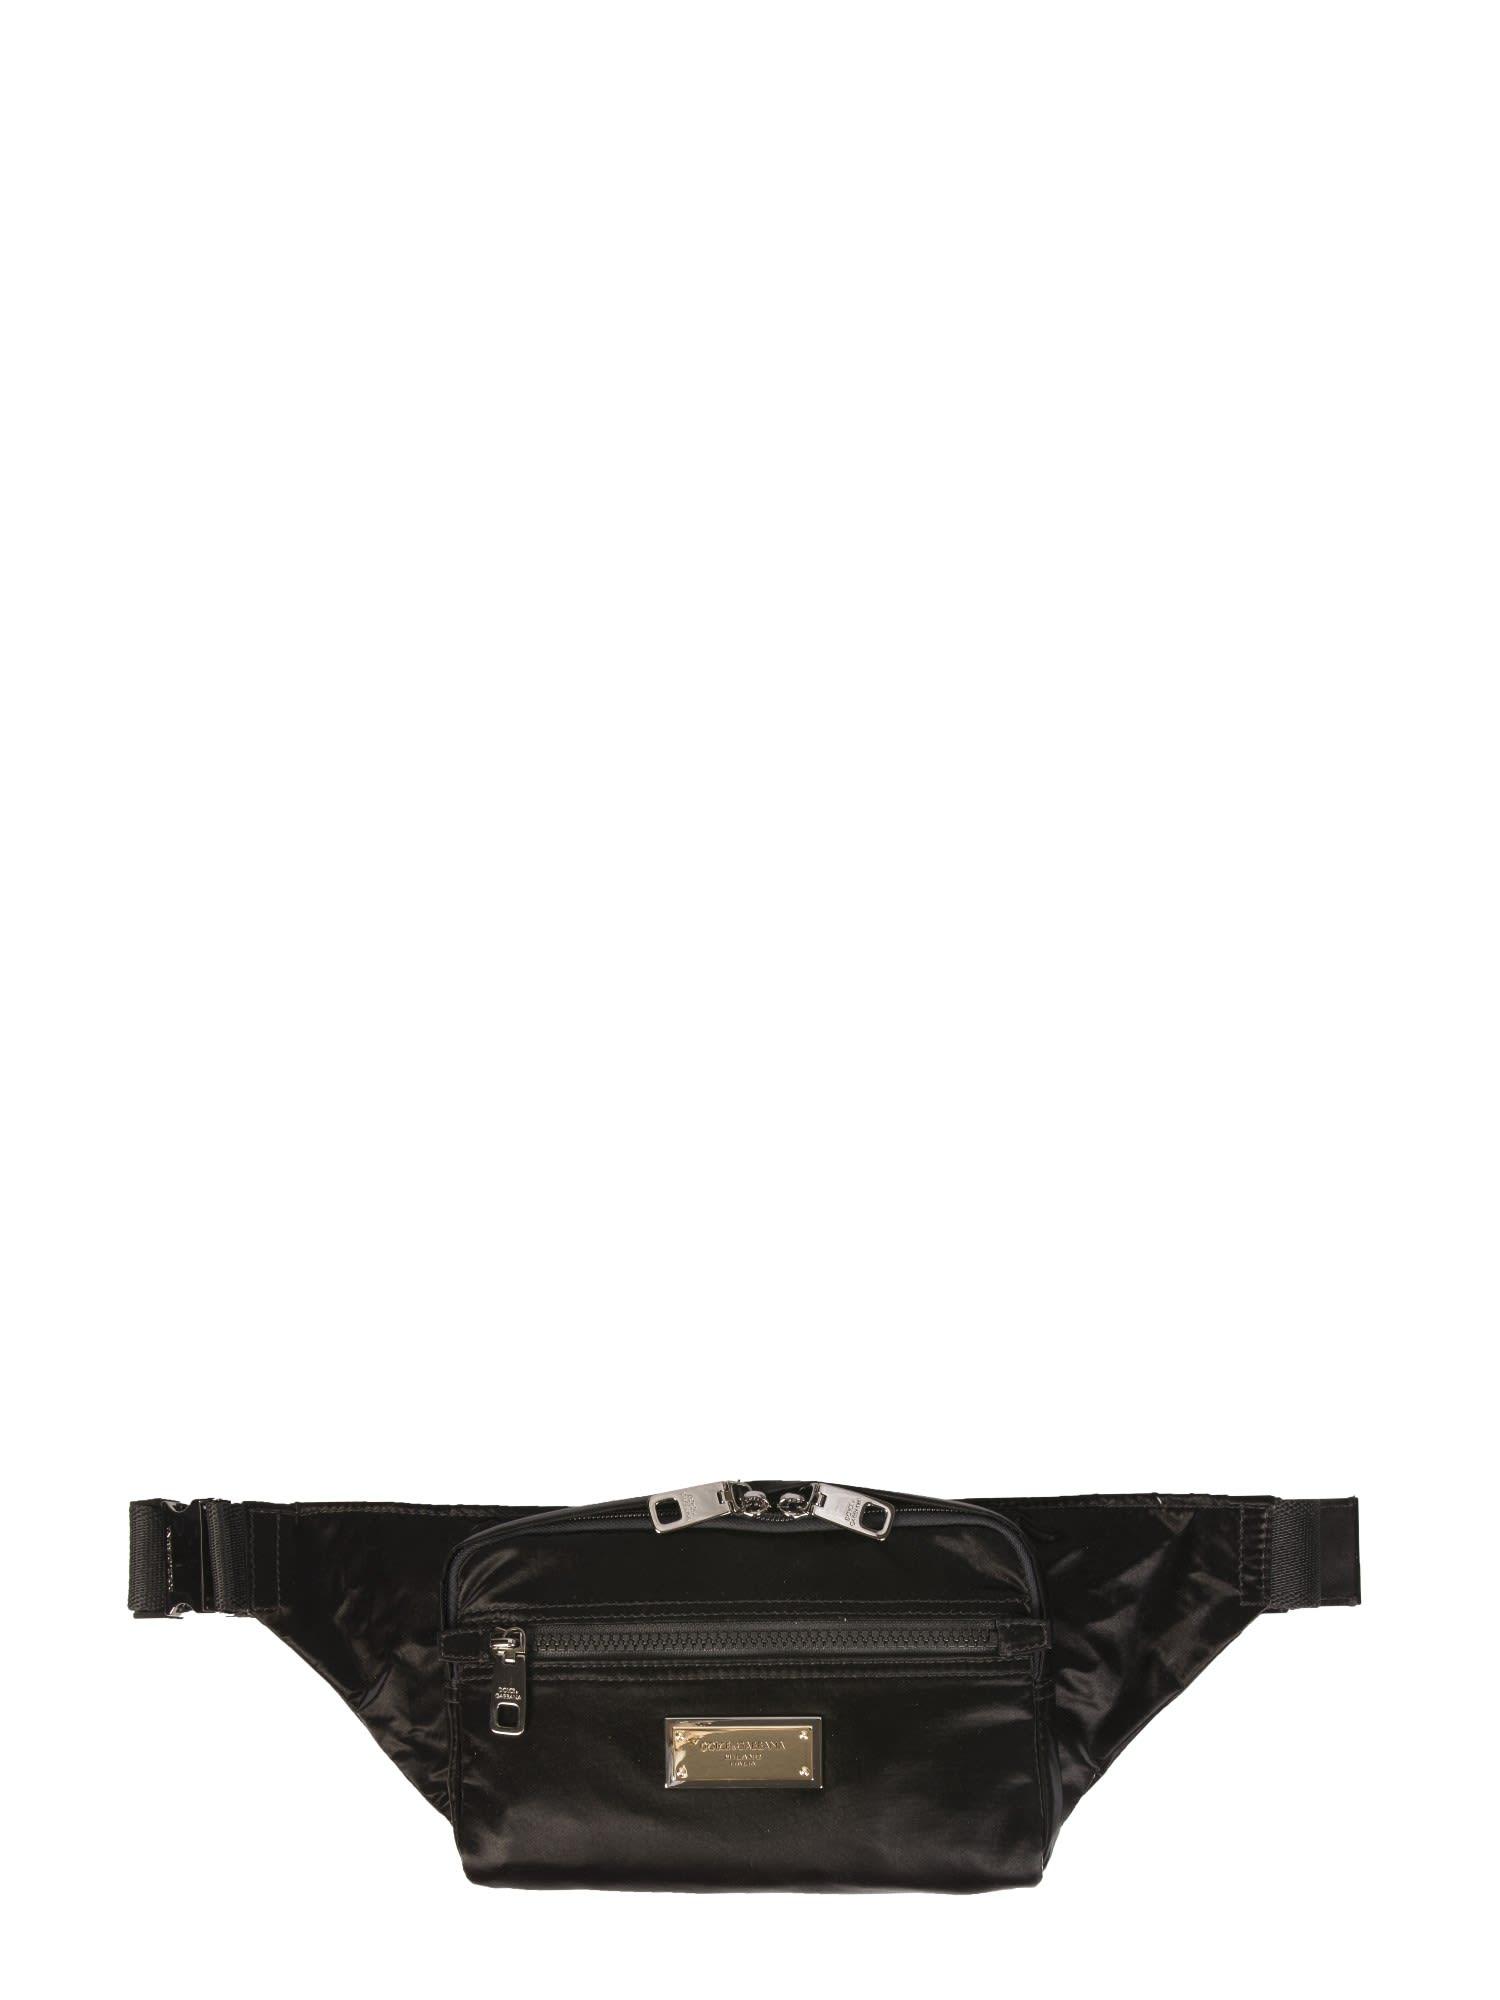 Dolce & Gabbana NYLON SAMBOILZ BELT BAG